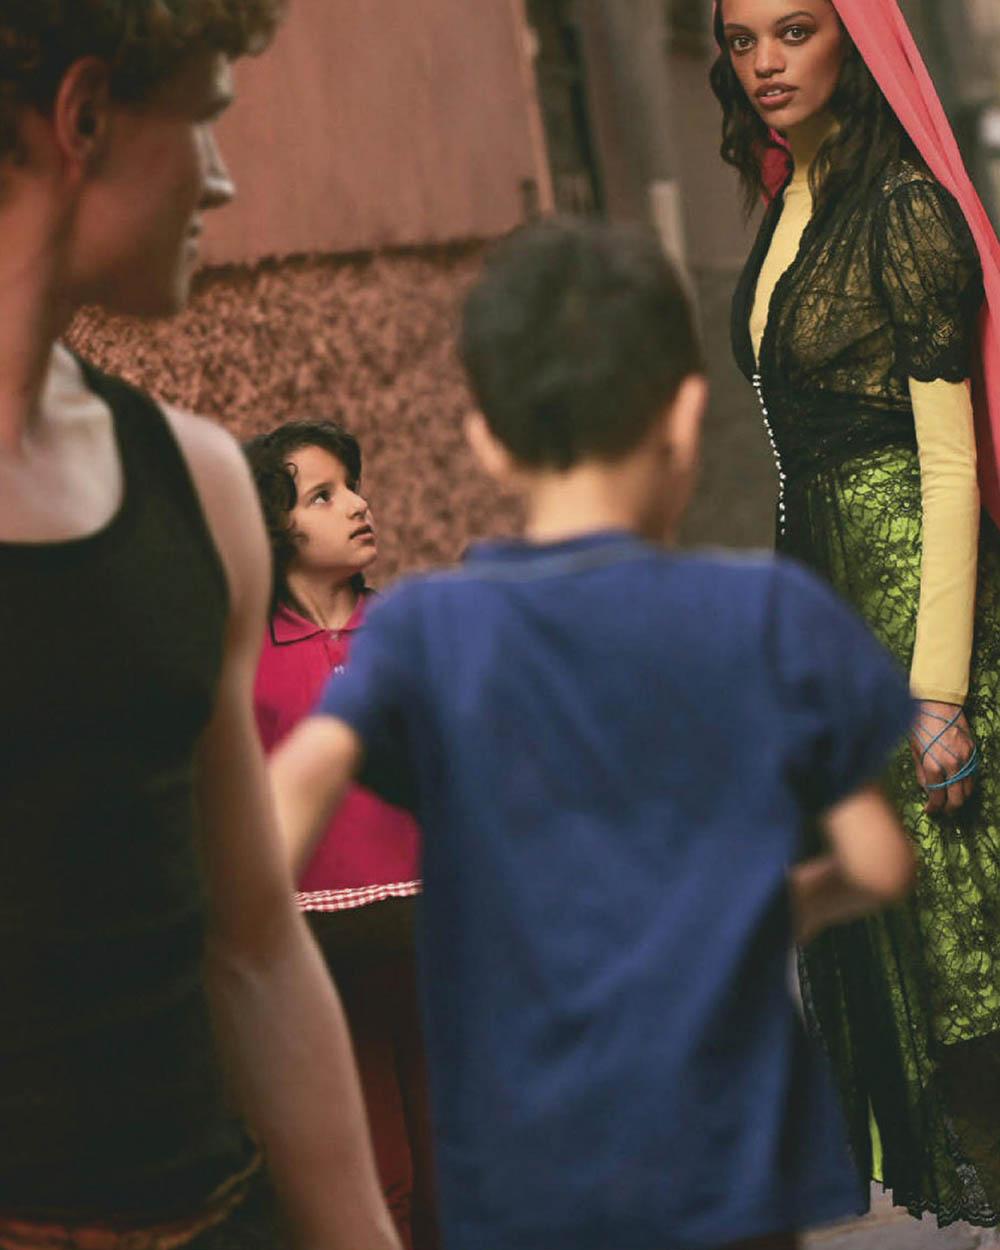 Kukua Williams and Timo Baumann by Daniel Clavero for Vogue Mexico & Latin America September 2019